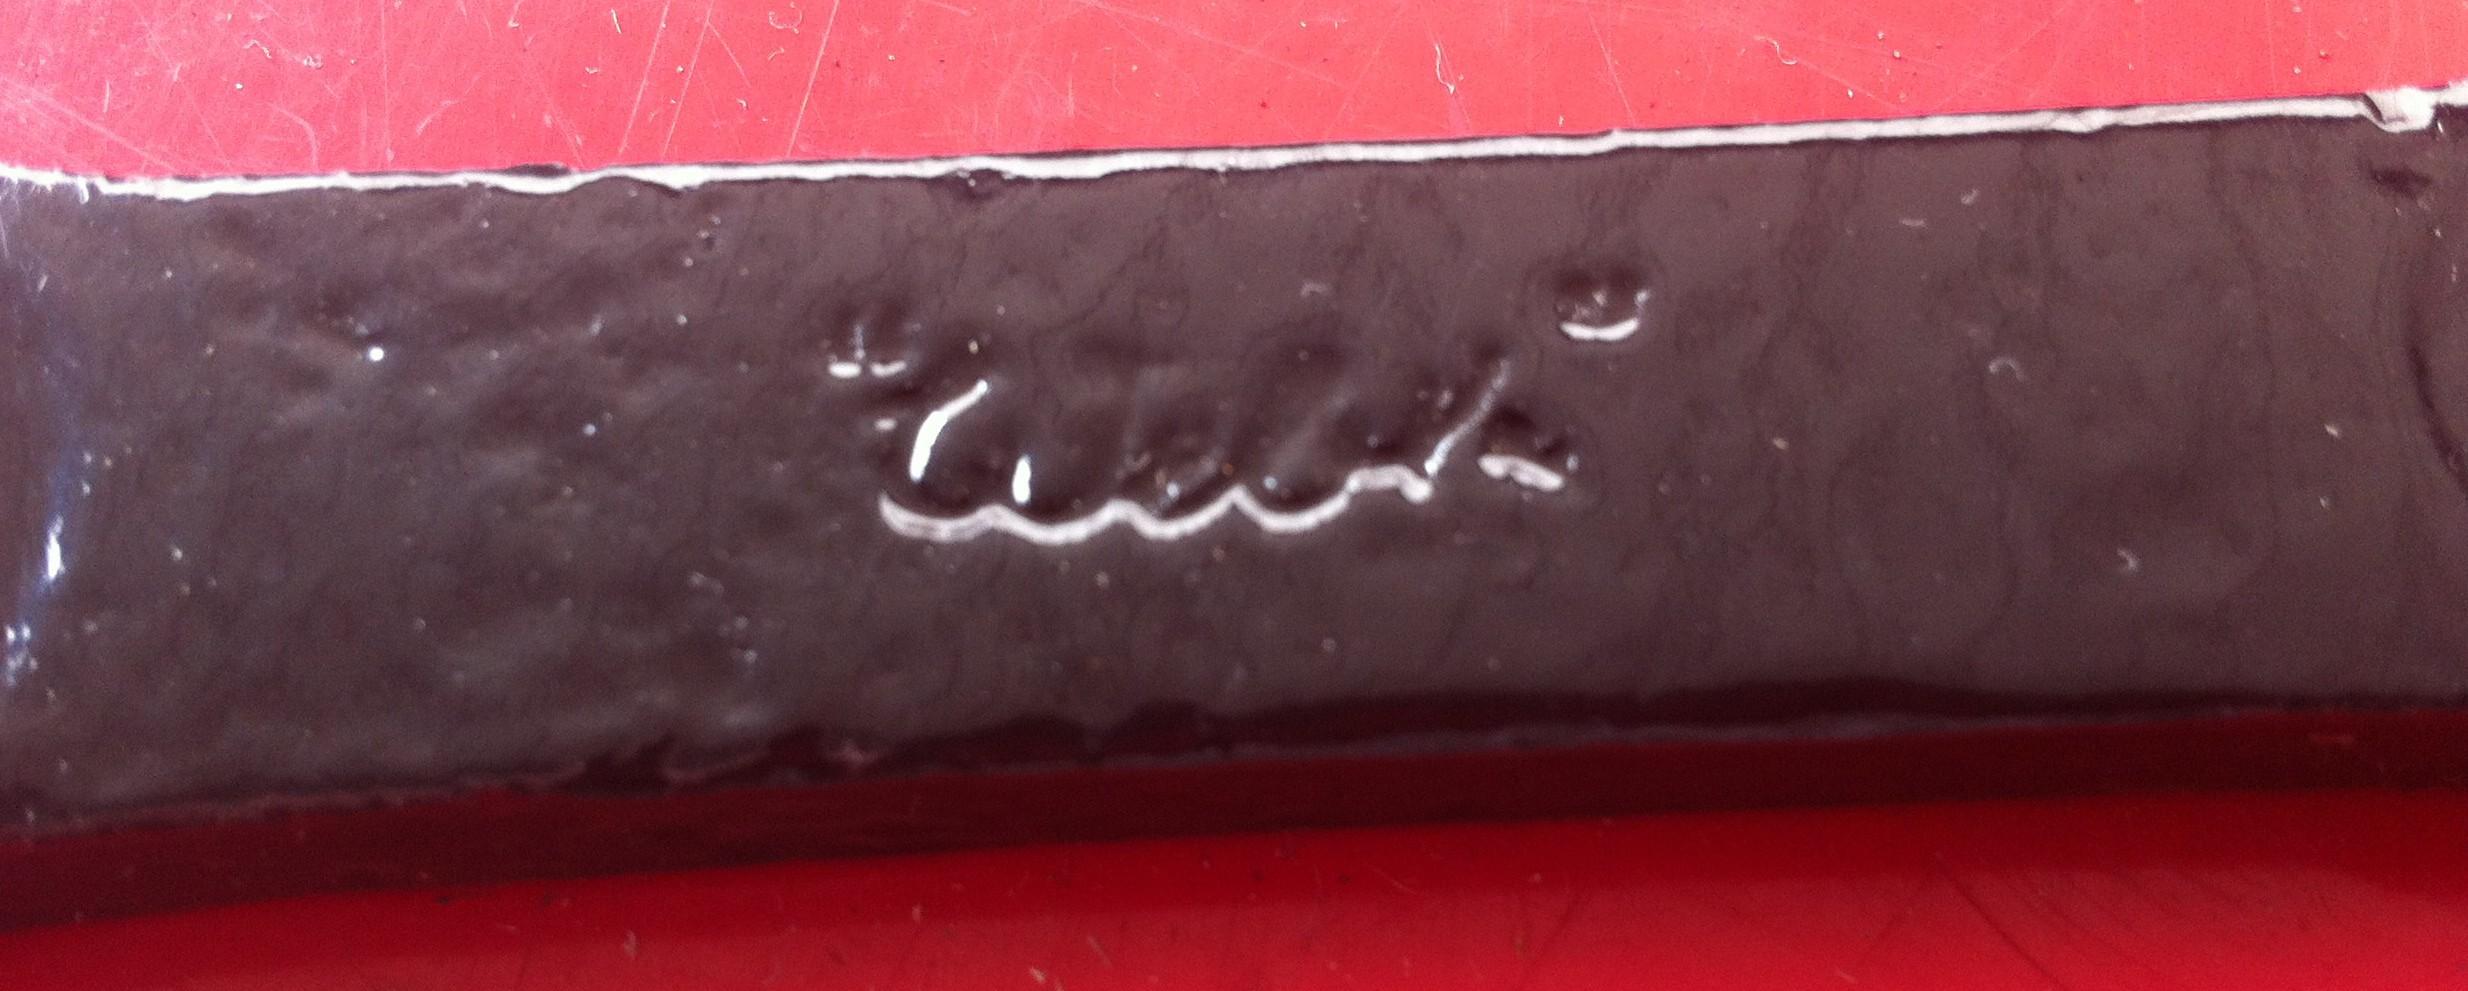 2012-04-09 09.14.09